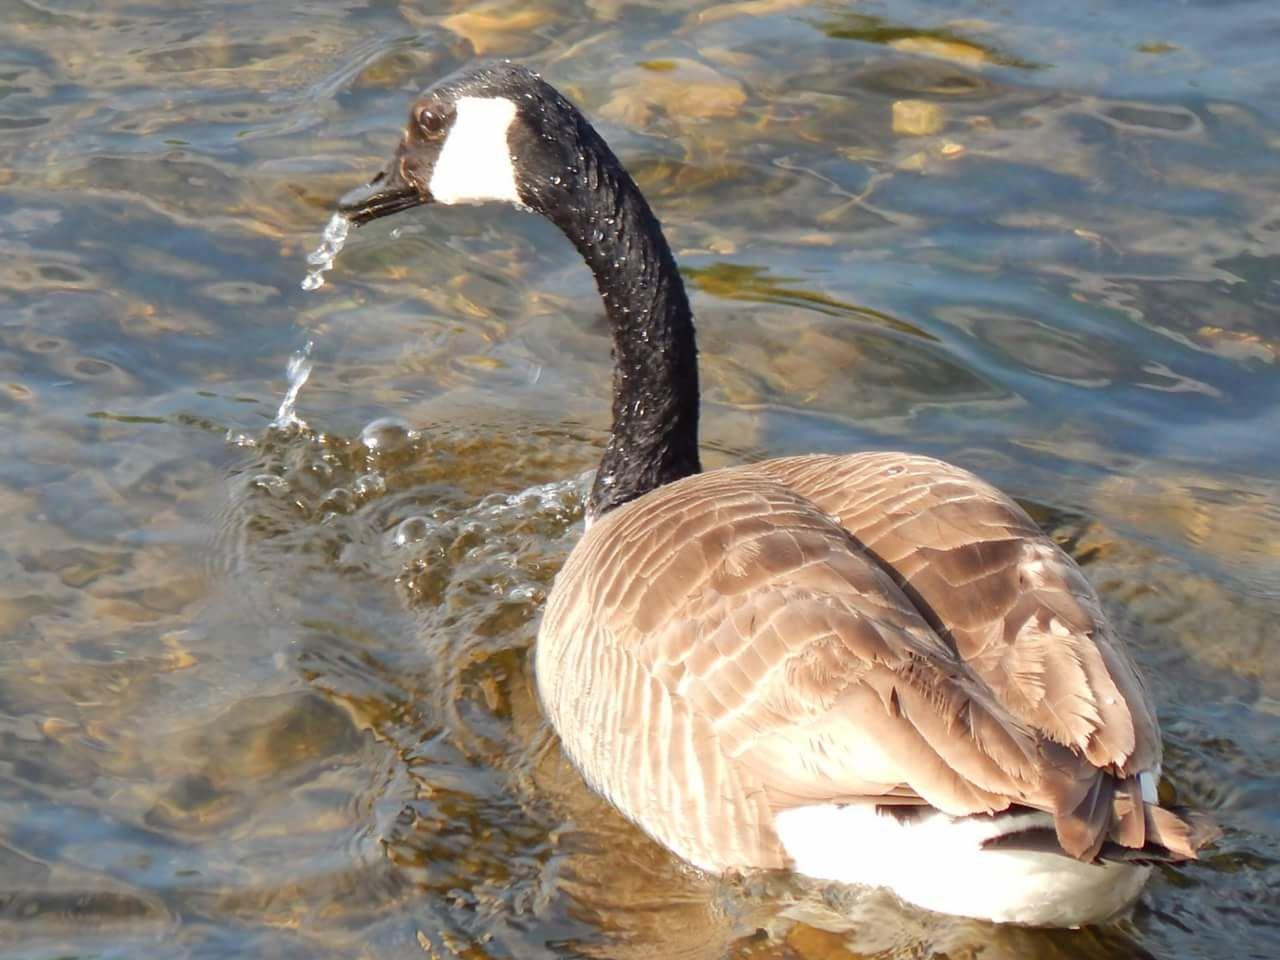 animals in the wild, animal themes, water, lake, one animal, bird, waterfront, swimming, animal wildlife, nature, water bird, no people, day, swan, outdoors, black swan, close-up